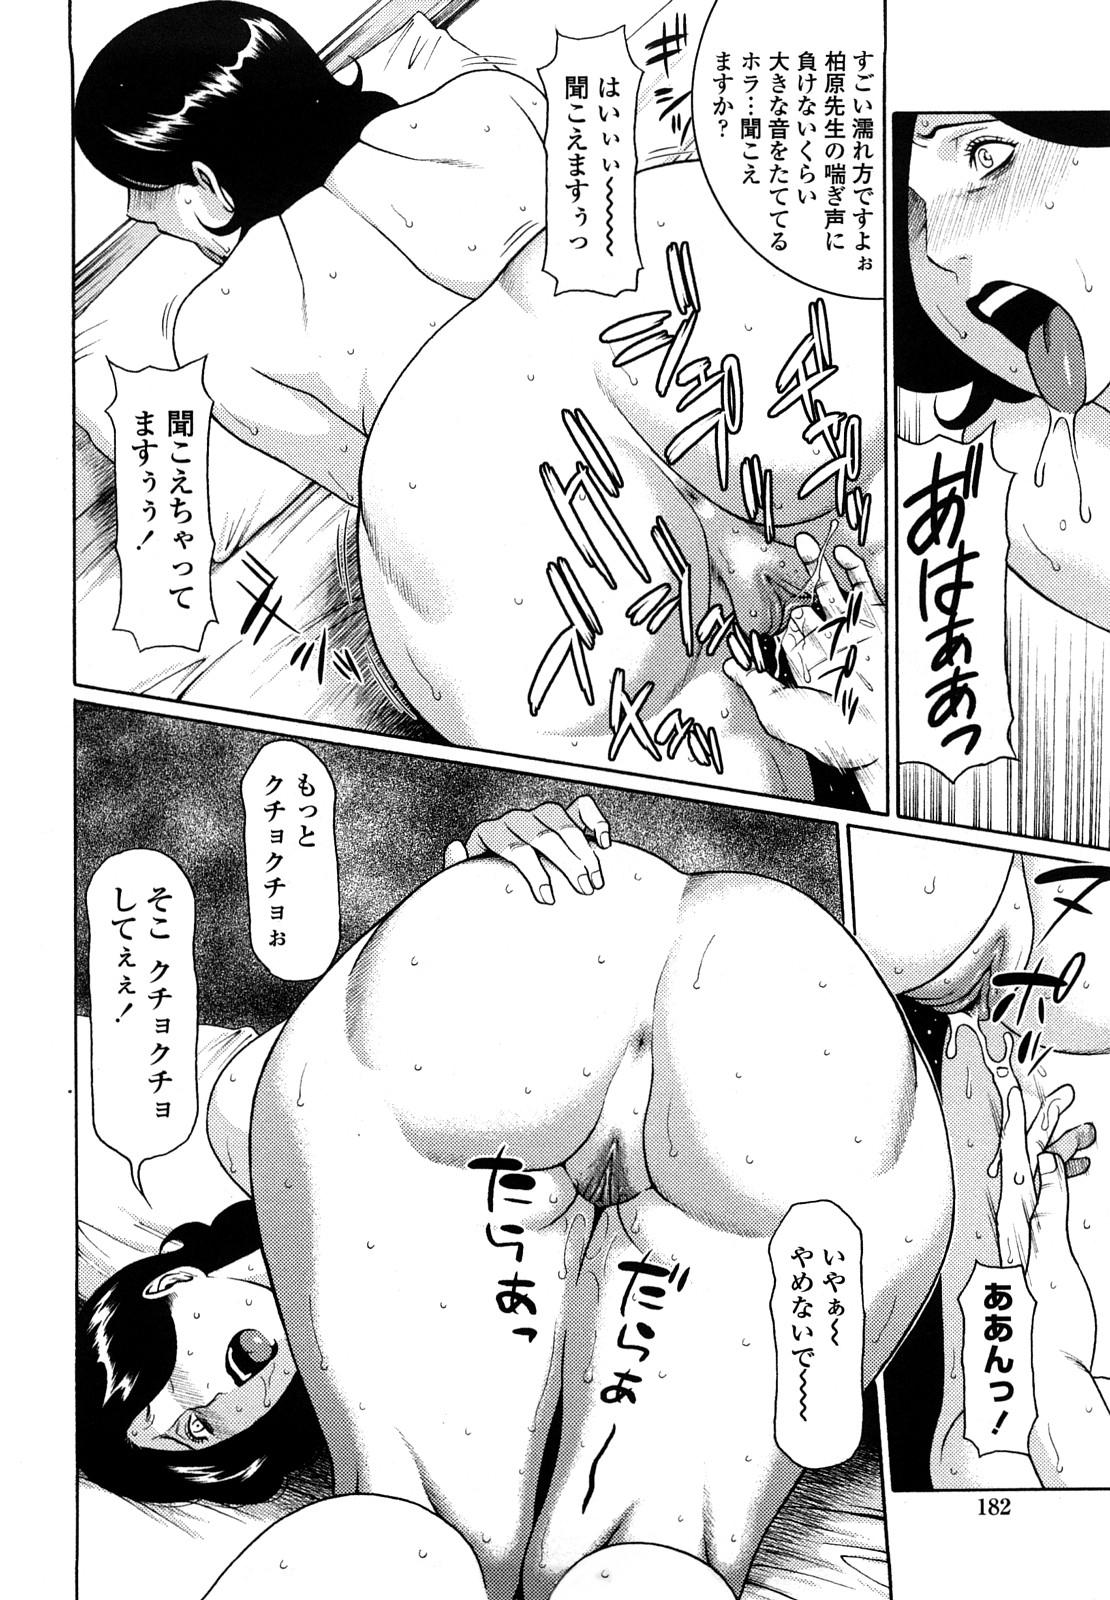 [Takasugi Kou] Kindan no Haha-Ana - Immorality Love-Hole [Decensored] 183